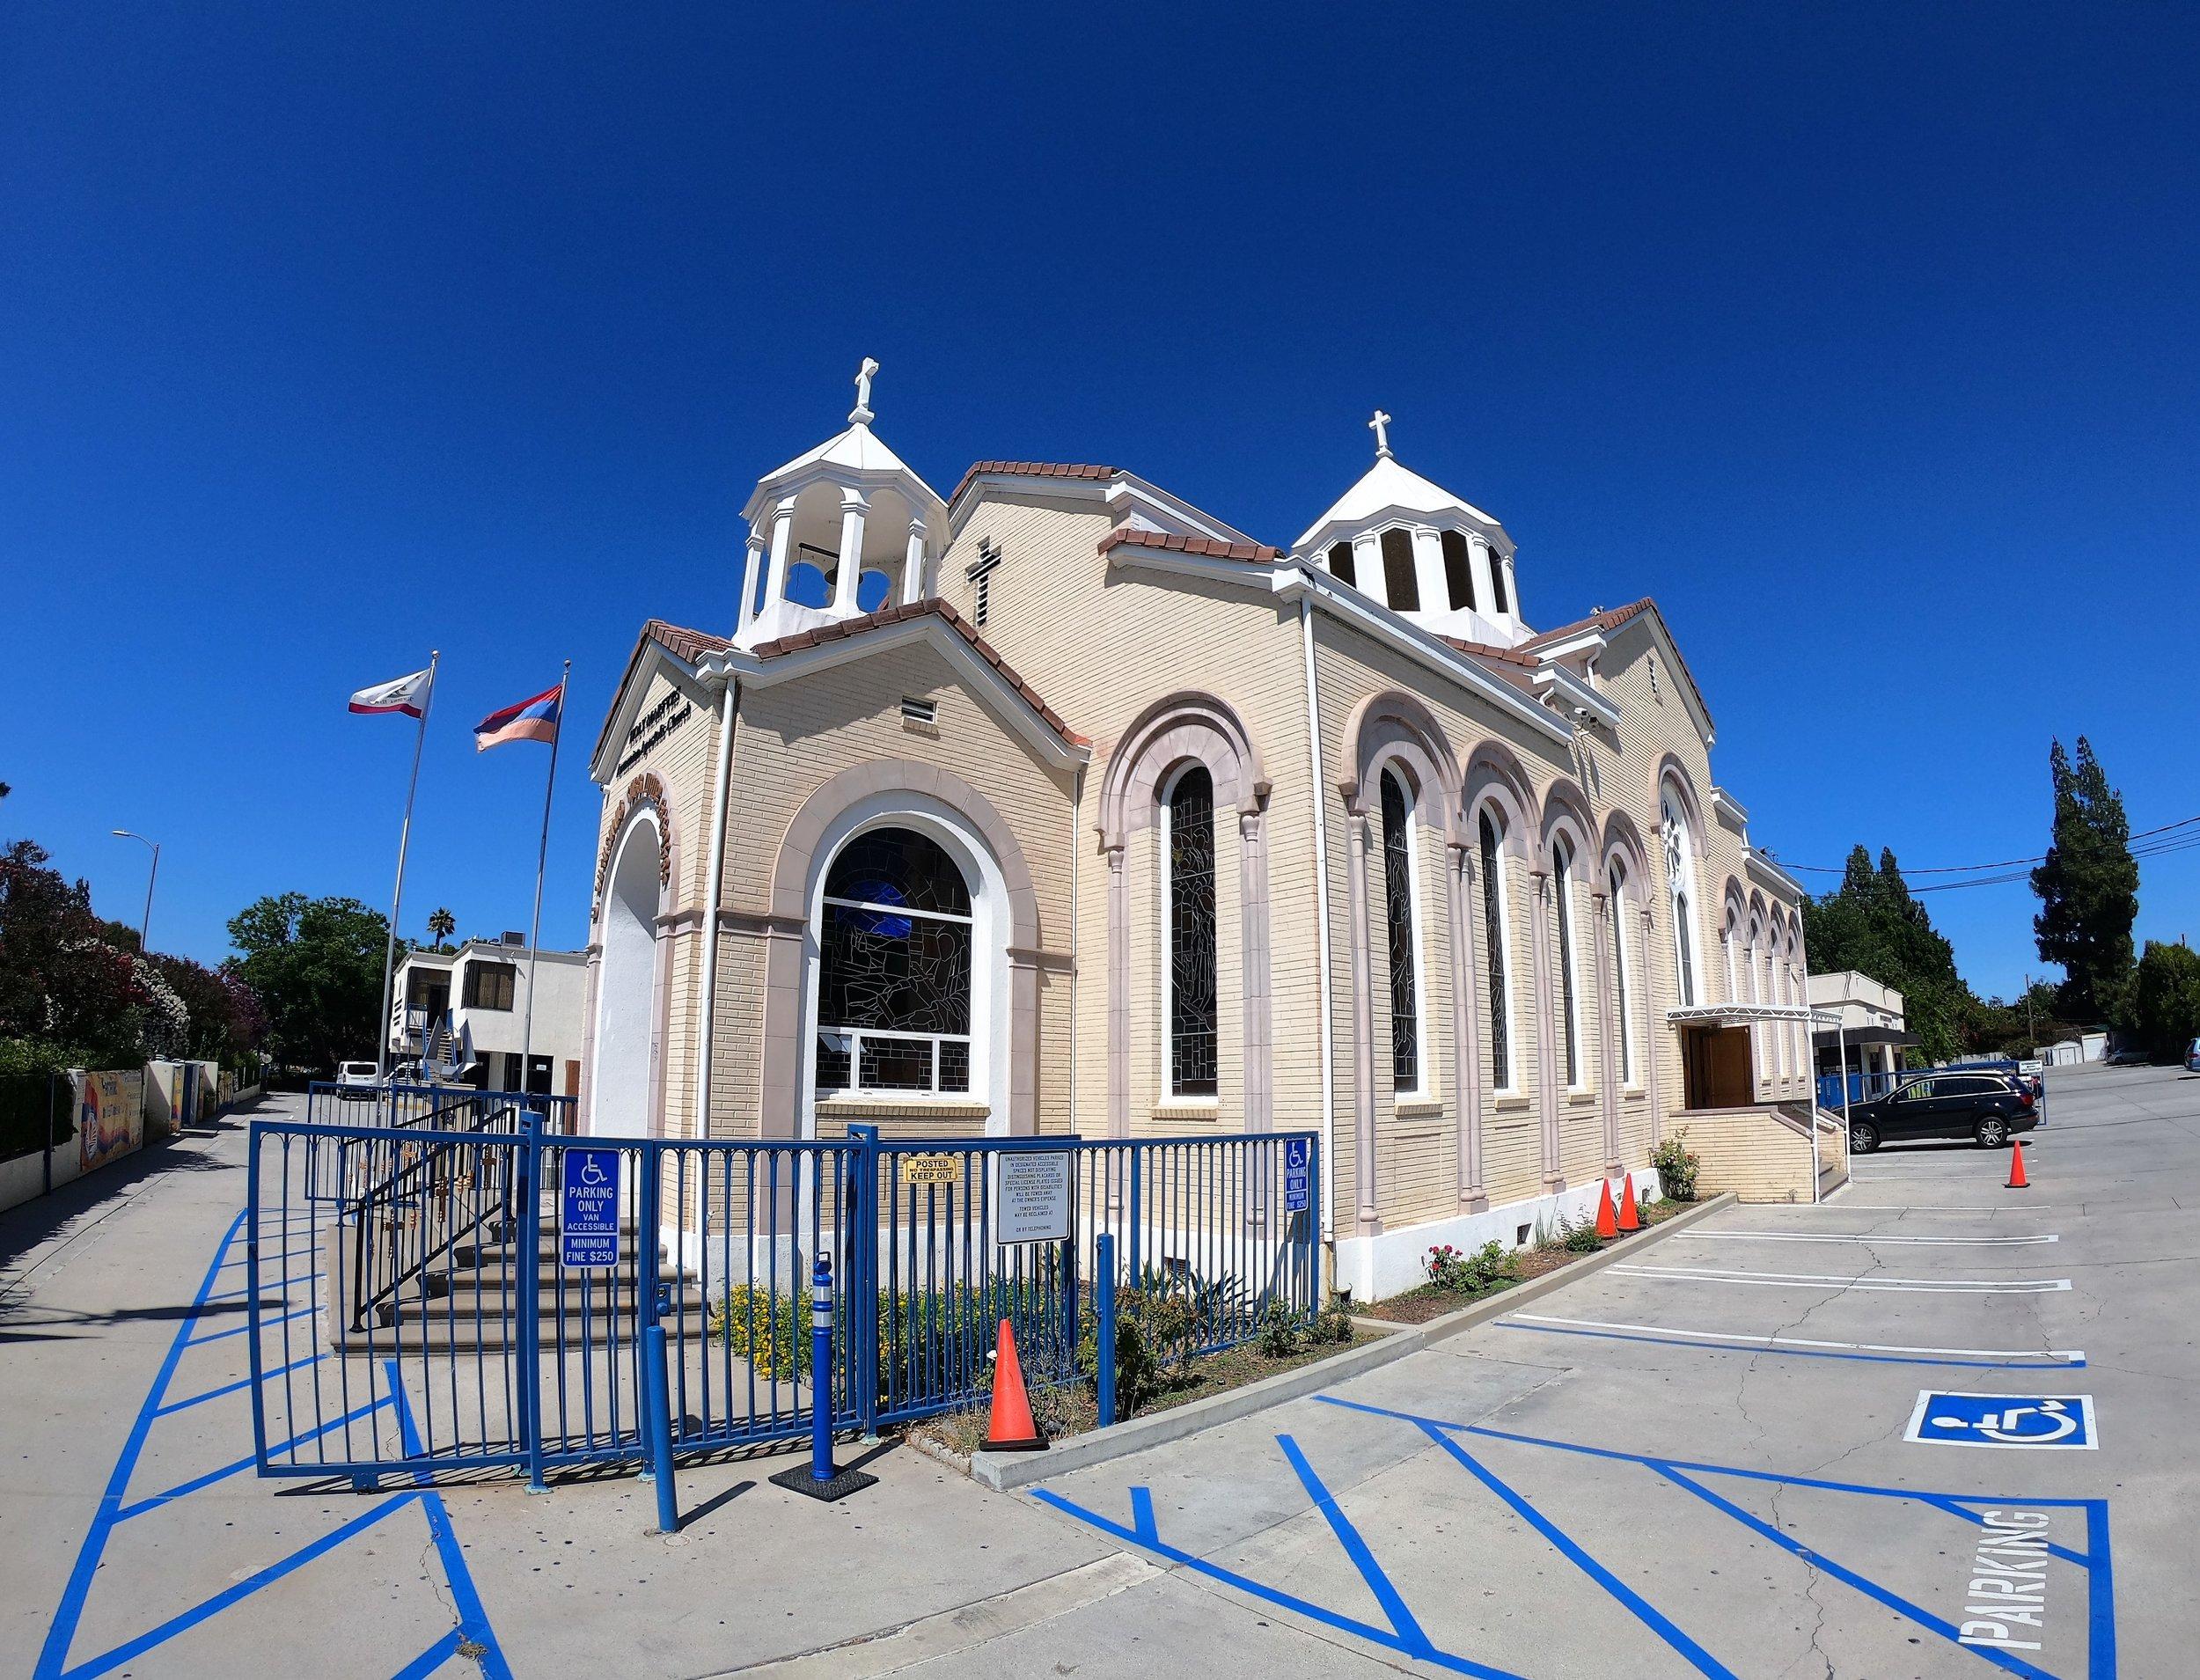 Holy Martyrs Armenian Apostolic Church in Los Angeles, California